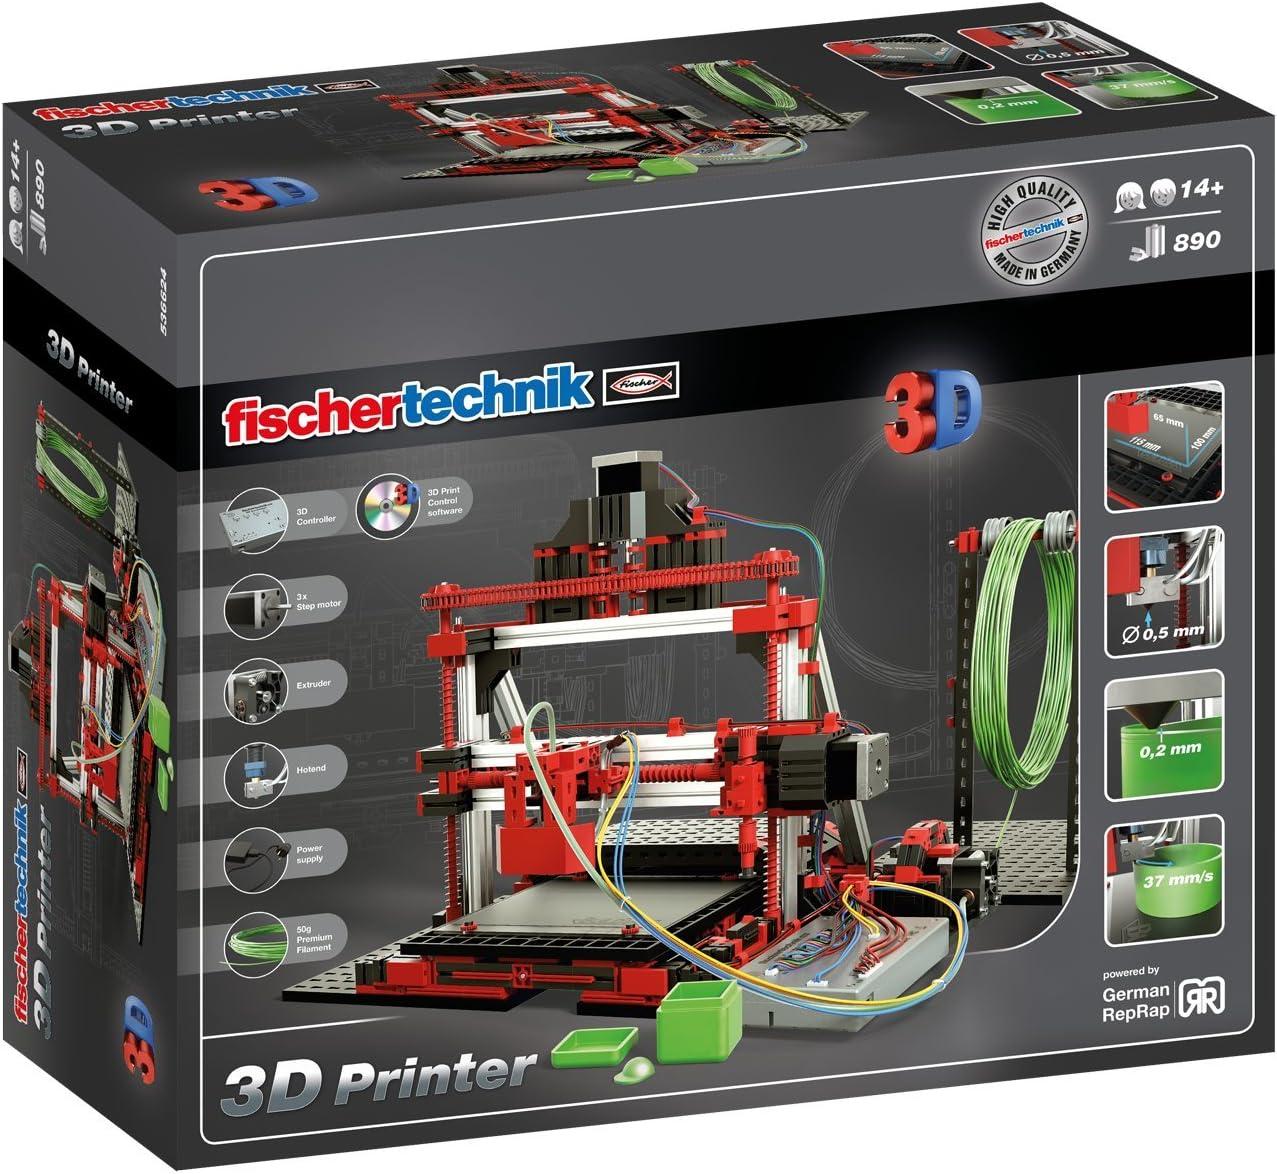 Fischertechnik 3D Printer – Construye tu Propia Impresora 3D ...